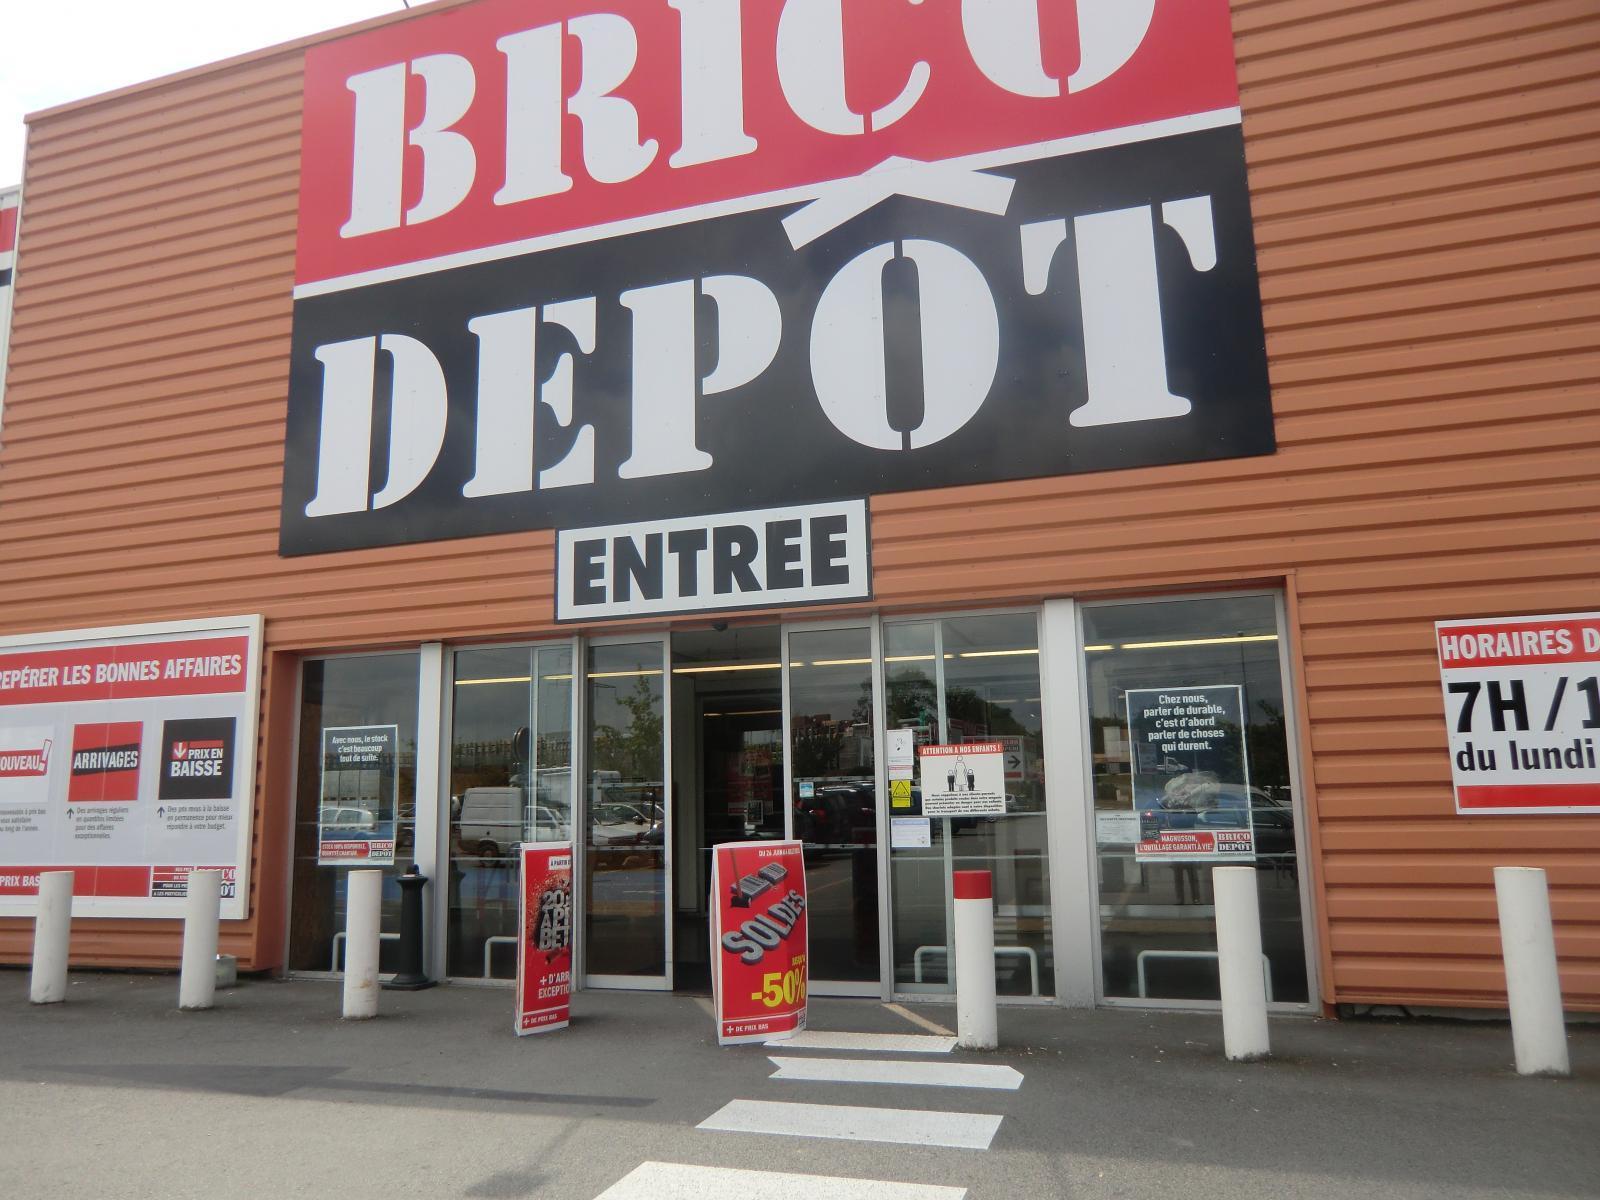 Marvelous Brico Depot Rennes Horaires #1: Brico Dépôt Cesson Sévigné : Brico Dépôt Cesson Sévigné